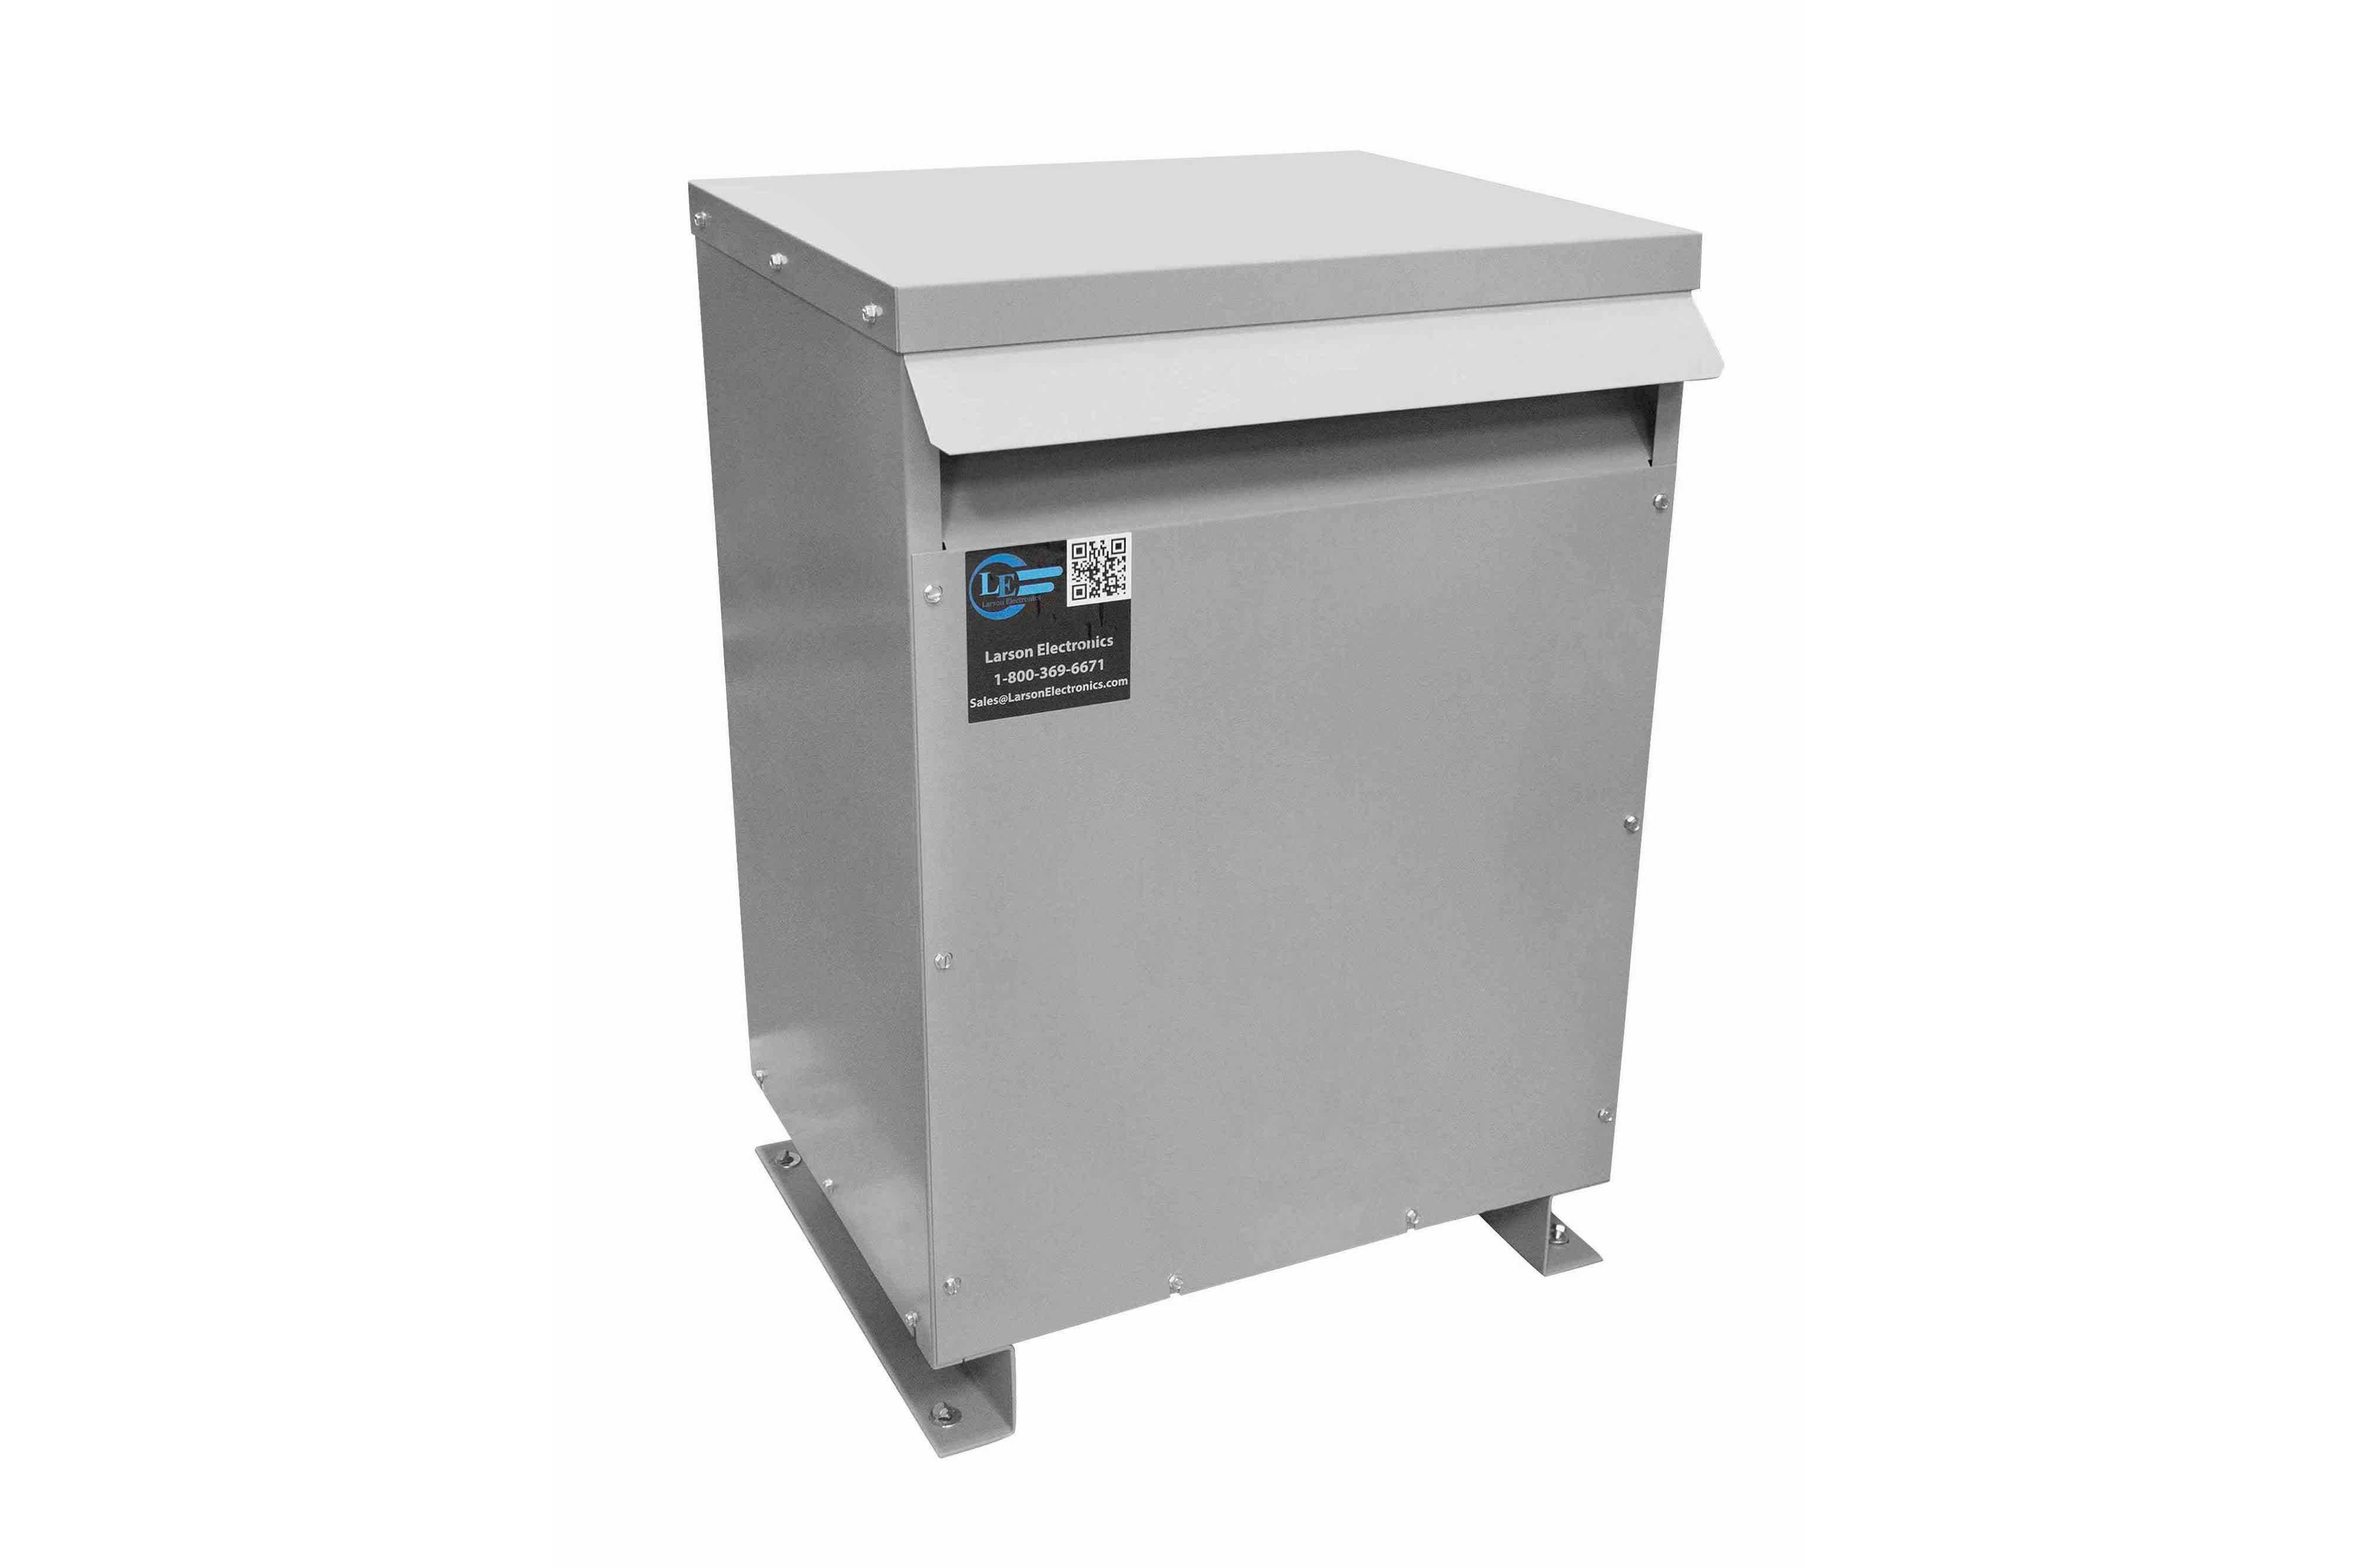 700 kVA 3PH Isolation Transformer, 480V Wye Primary, 380Y/220 Wye-N Secondary, N3R, Ventilated, 60 Hz